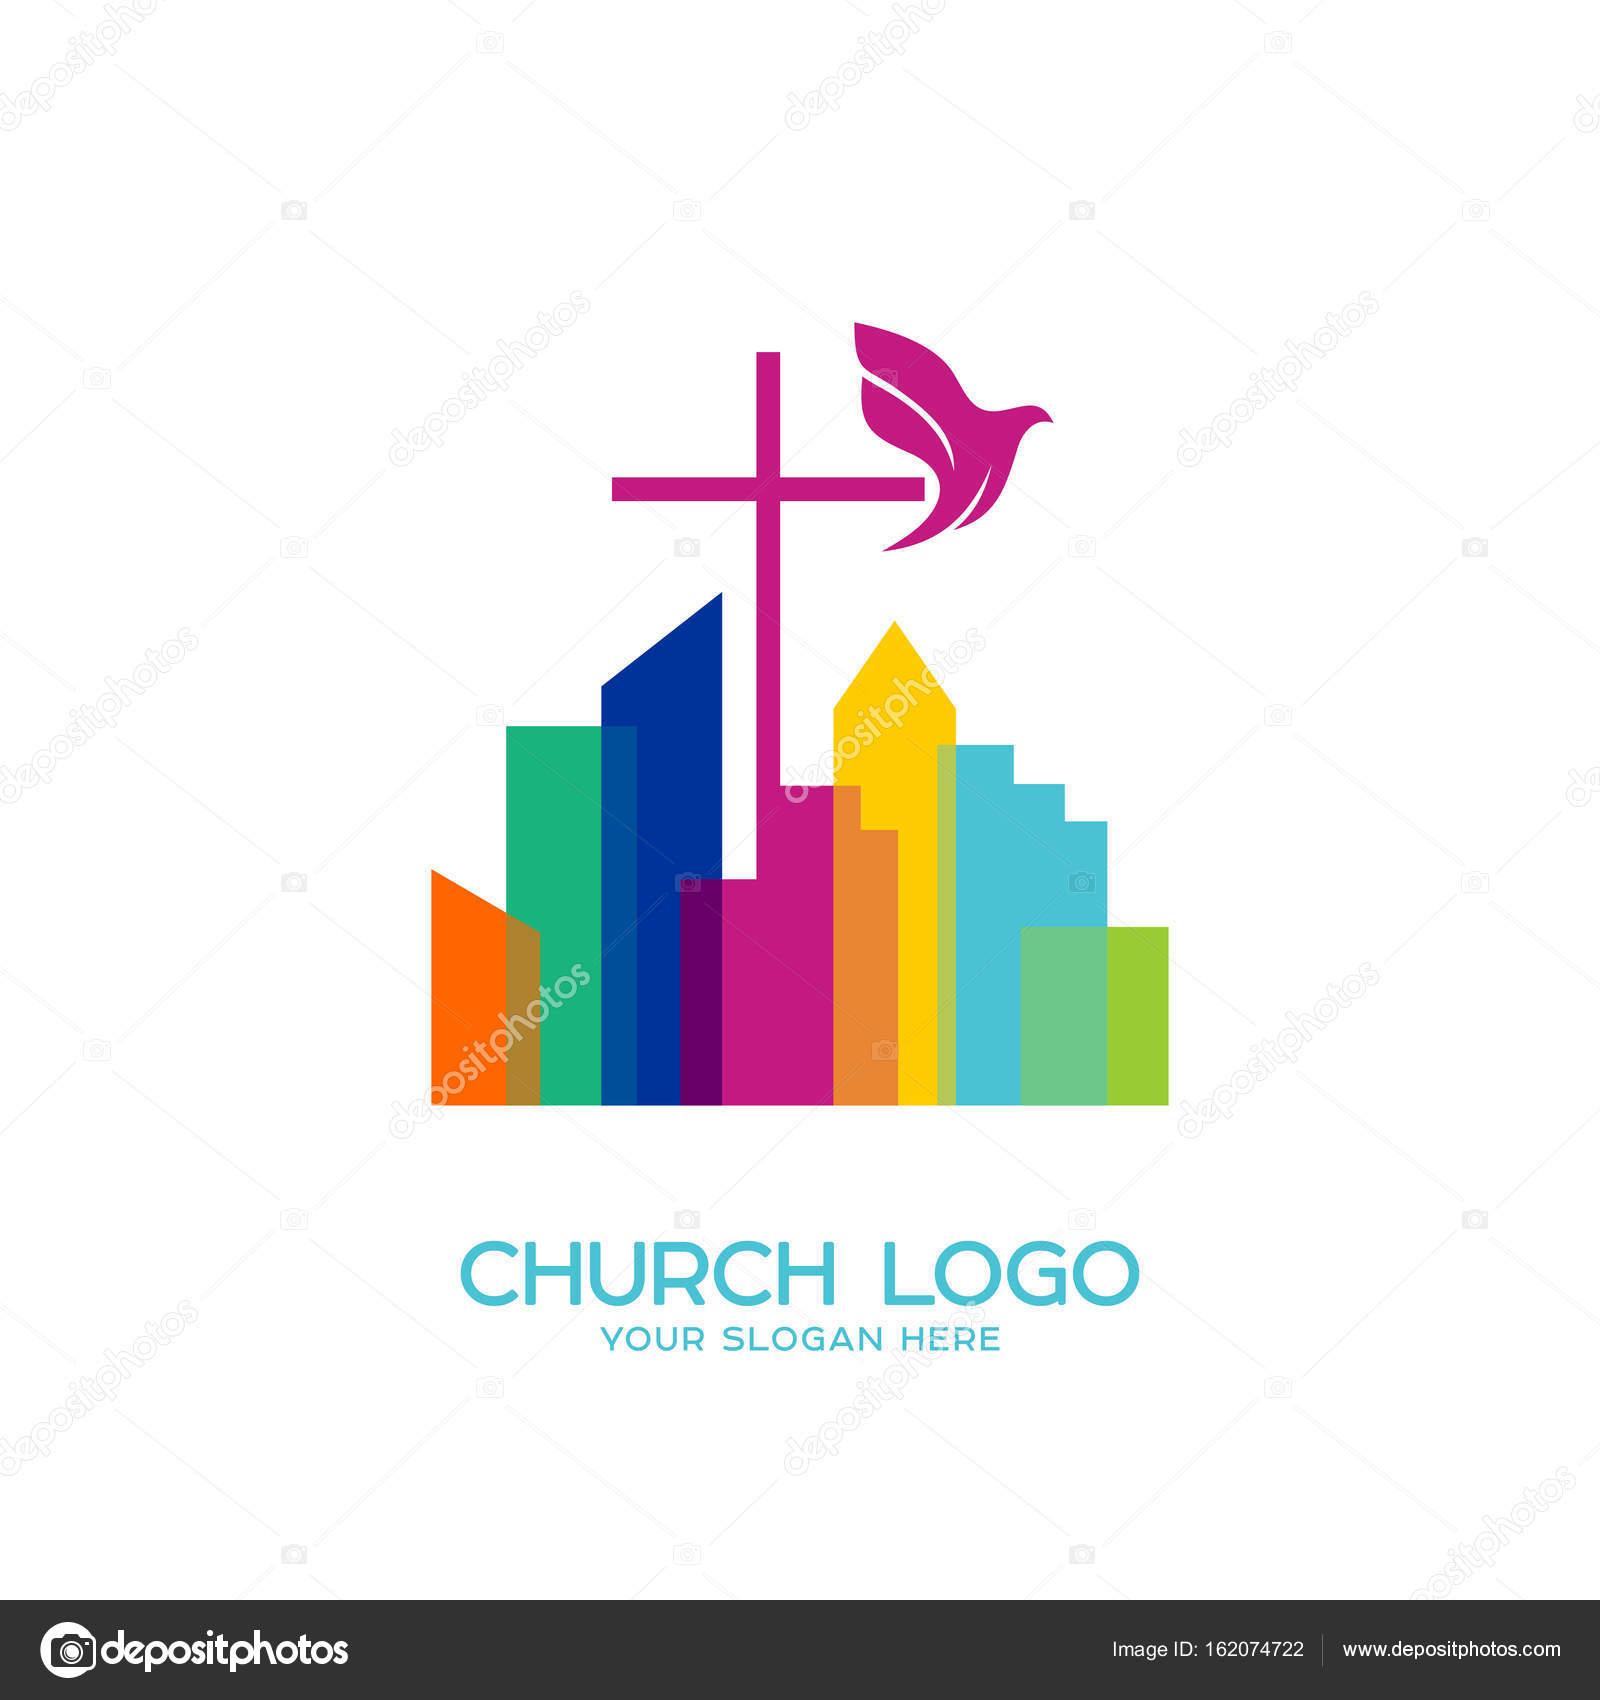 Church logo christian symbols the cross of jesus and the dove over church logo christian symbols the cross of jesus and the dove over the city thecheapjerseys Gallery